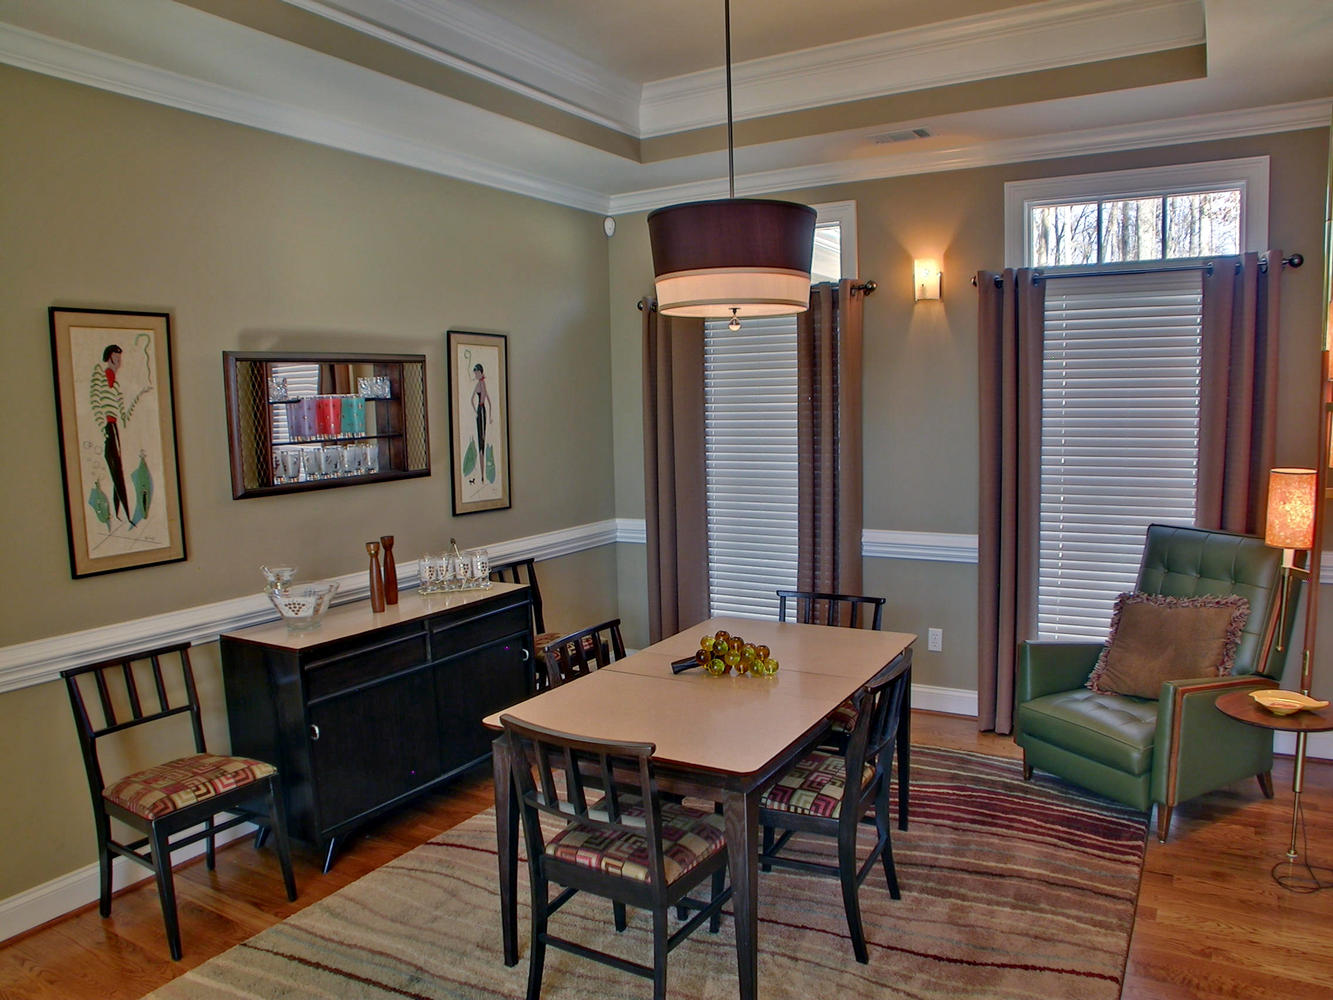 Portfolio 3 Hartwell GA 30643-large-004-4-Dining Room-1333x1000-72dpi